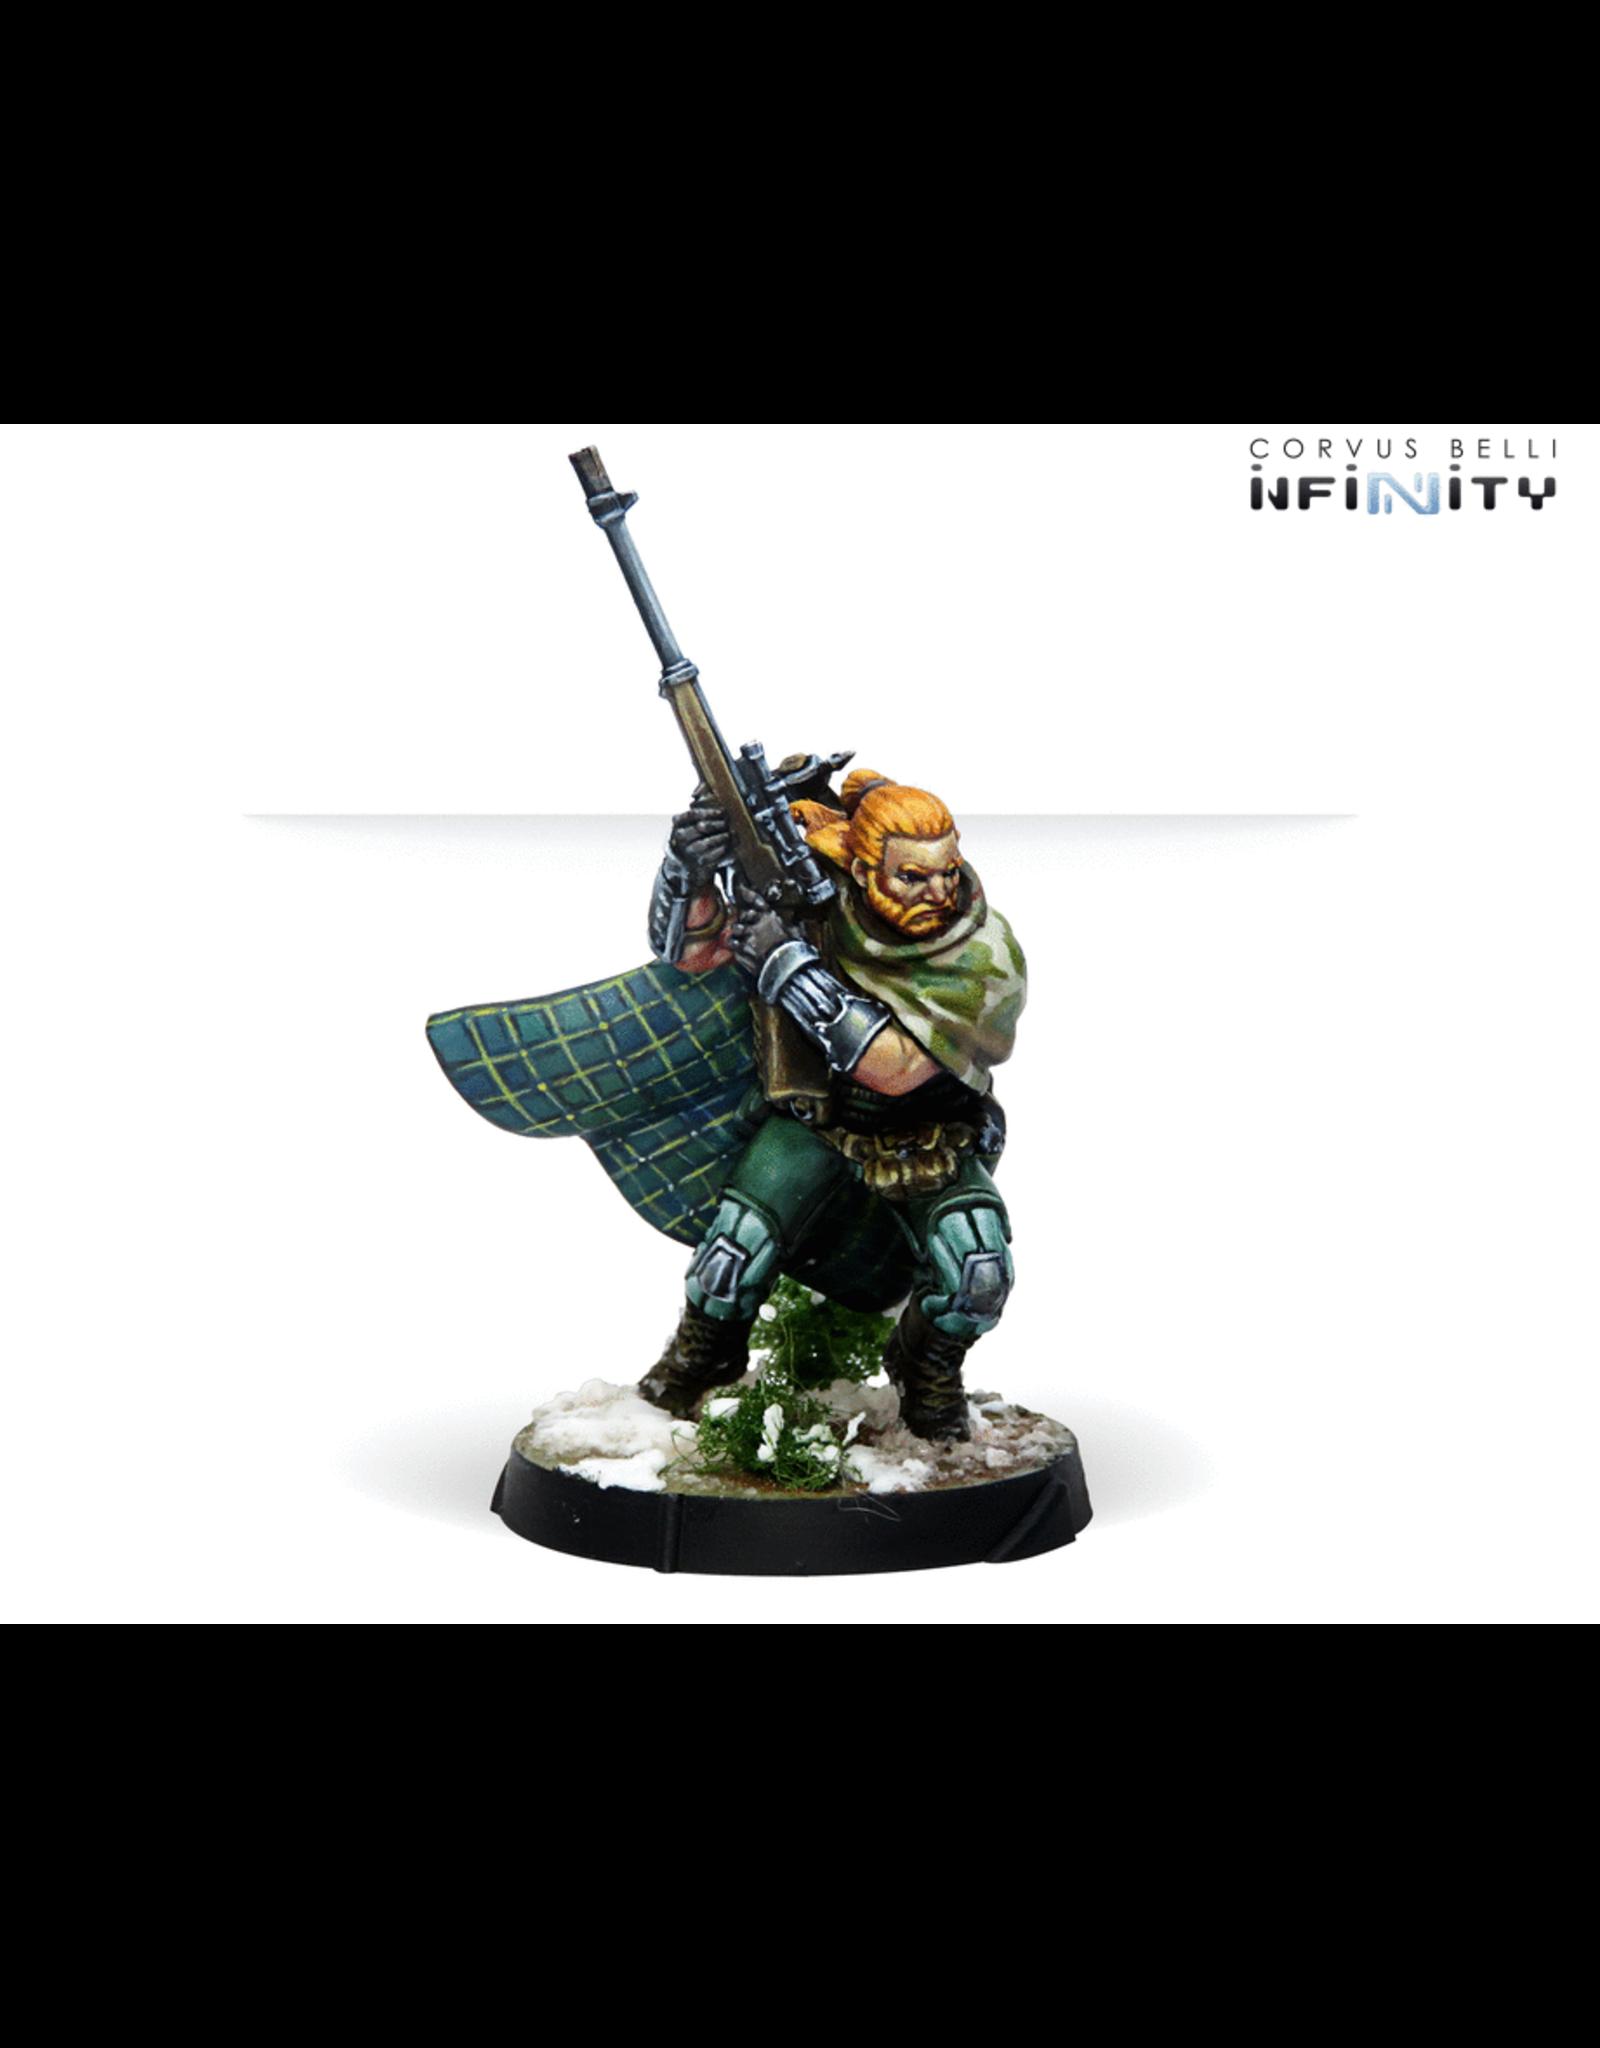 Corvus Belli Infinity: Pavel Aleksei McMannus, Spetsgruppa C